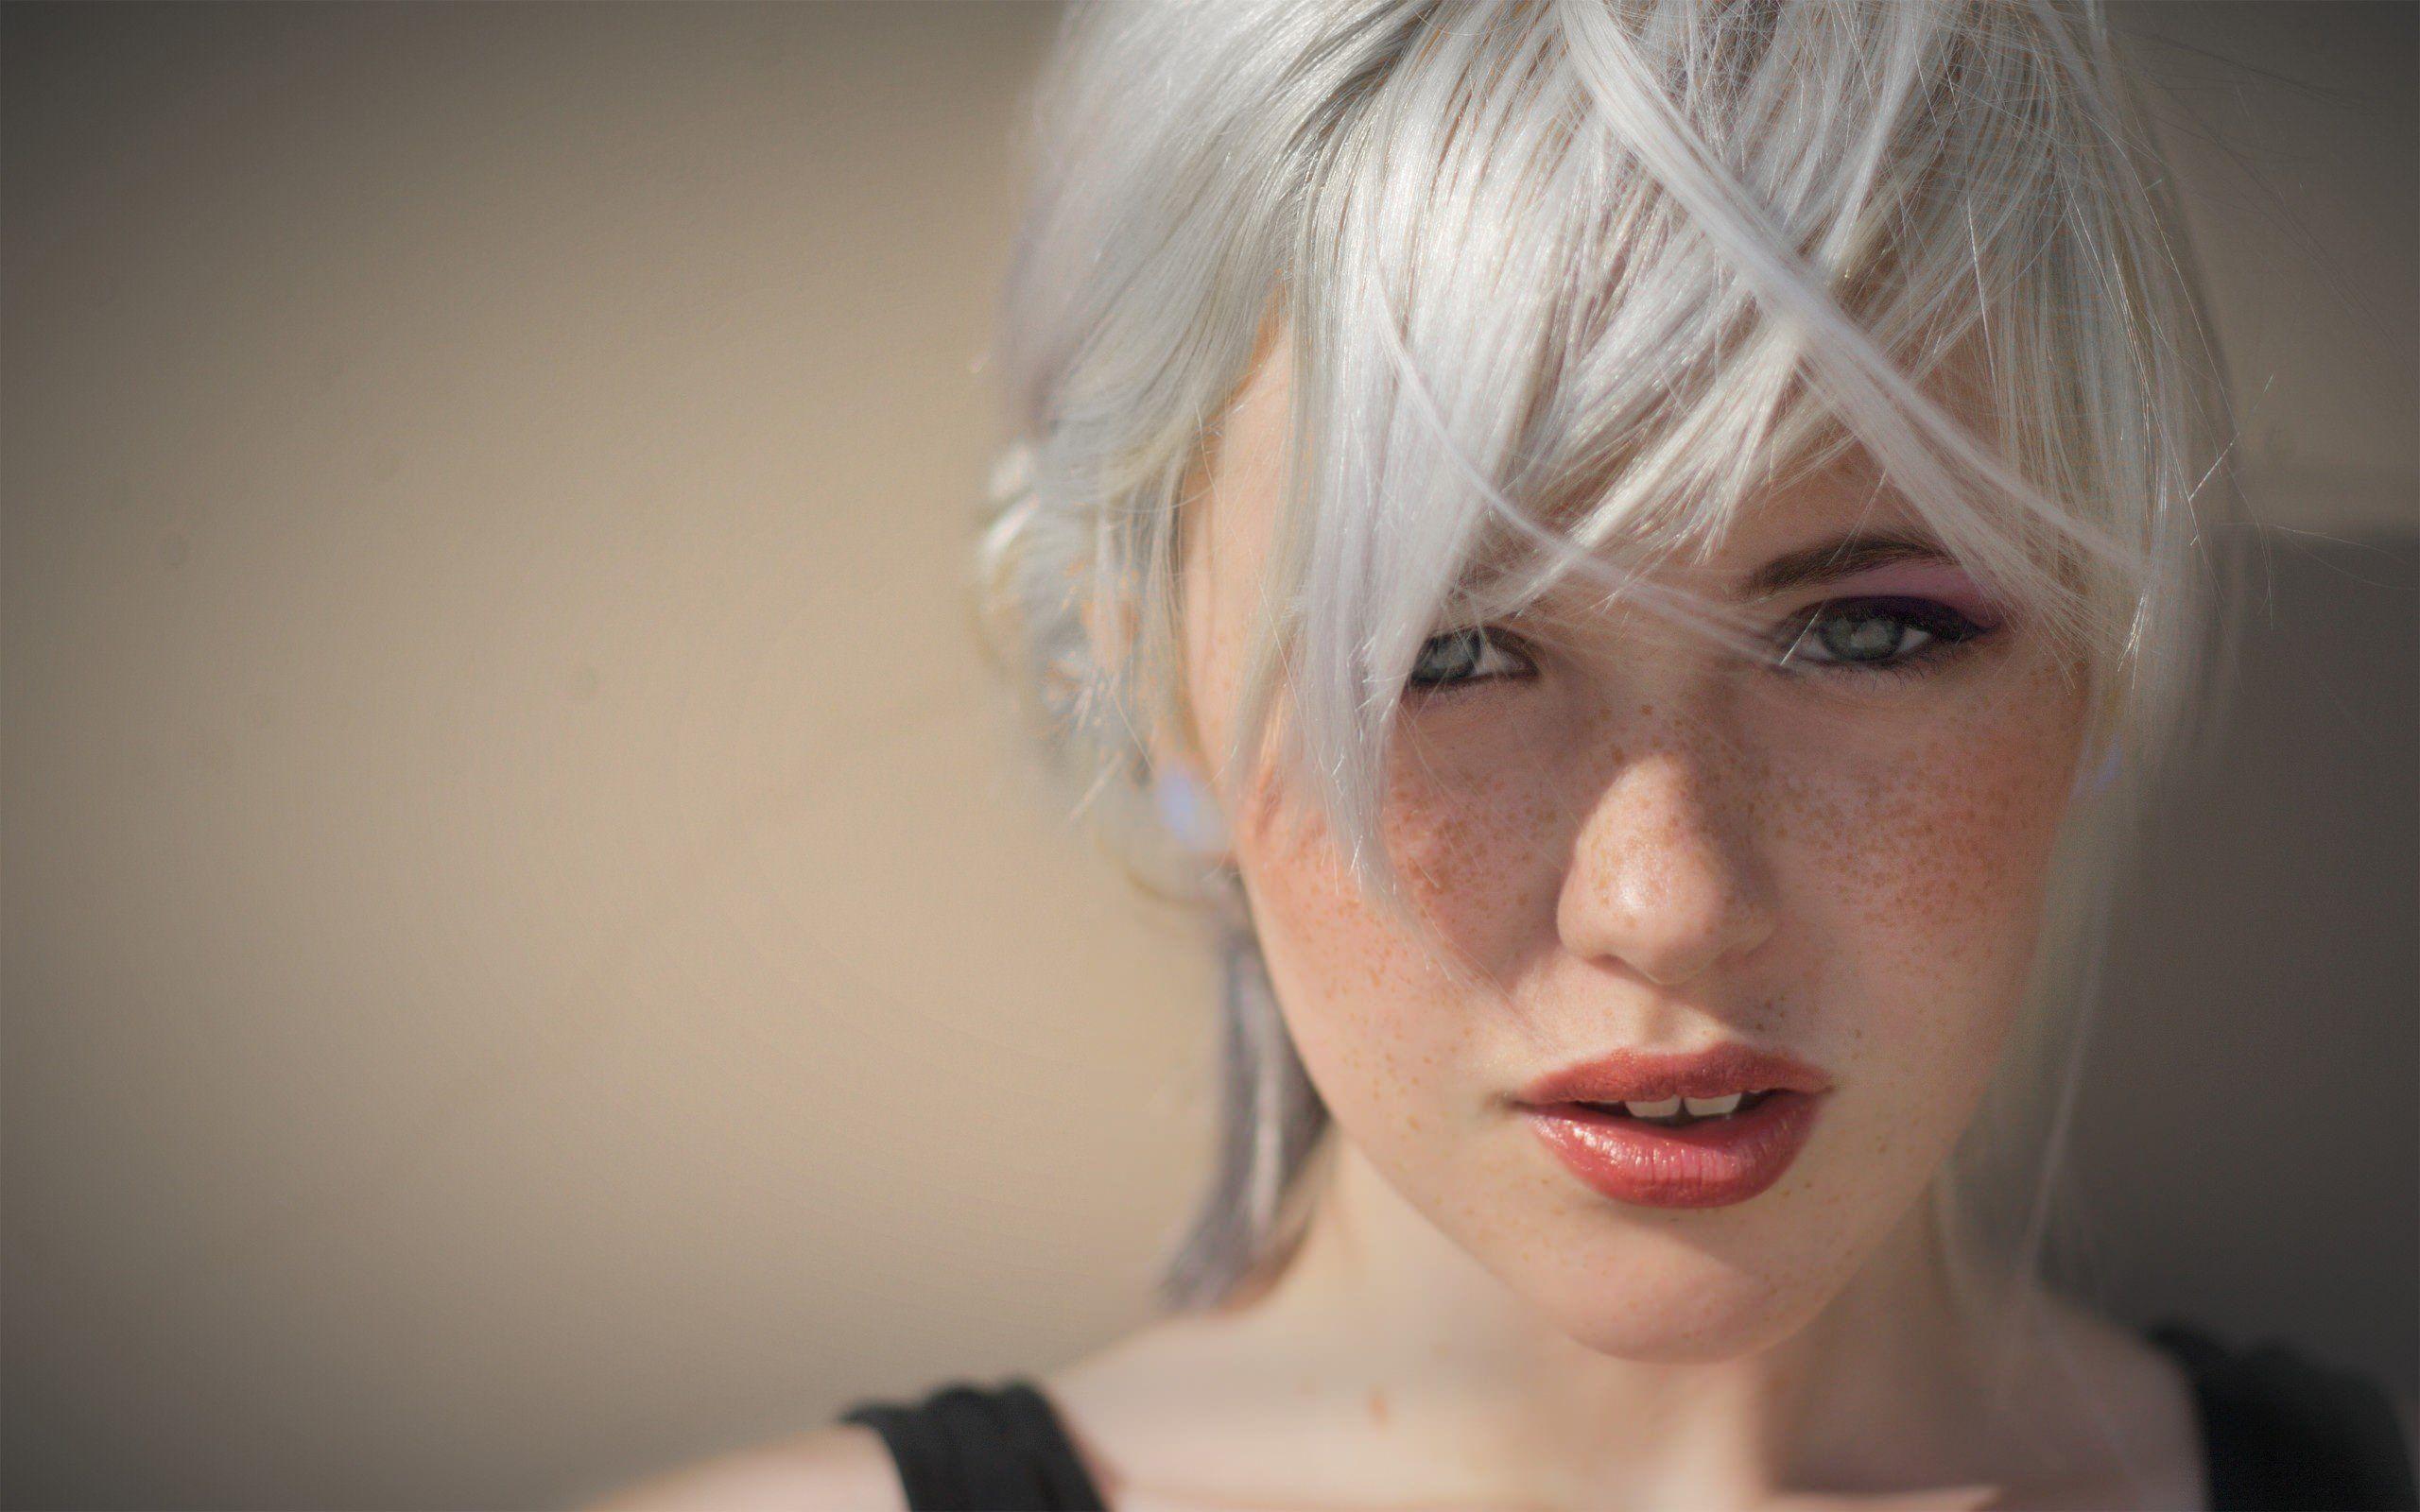 Nascondere i capelli bianchi  4 ricette naturali  0e3a0245eee1